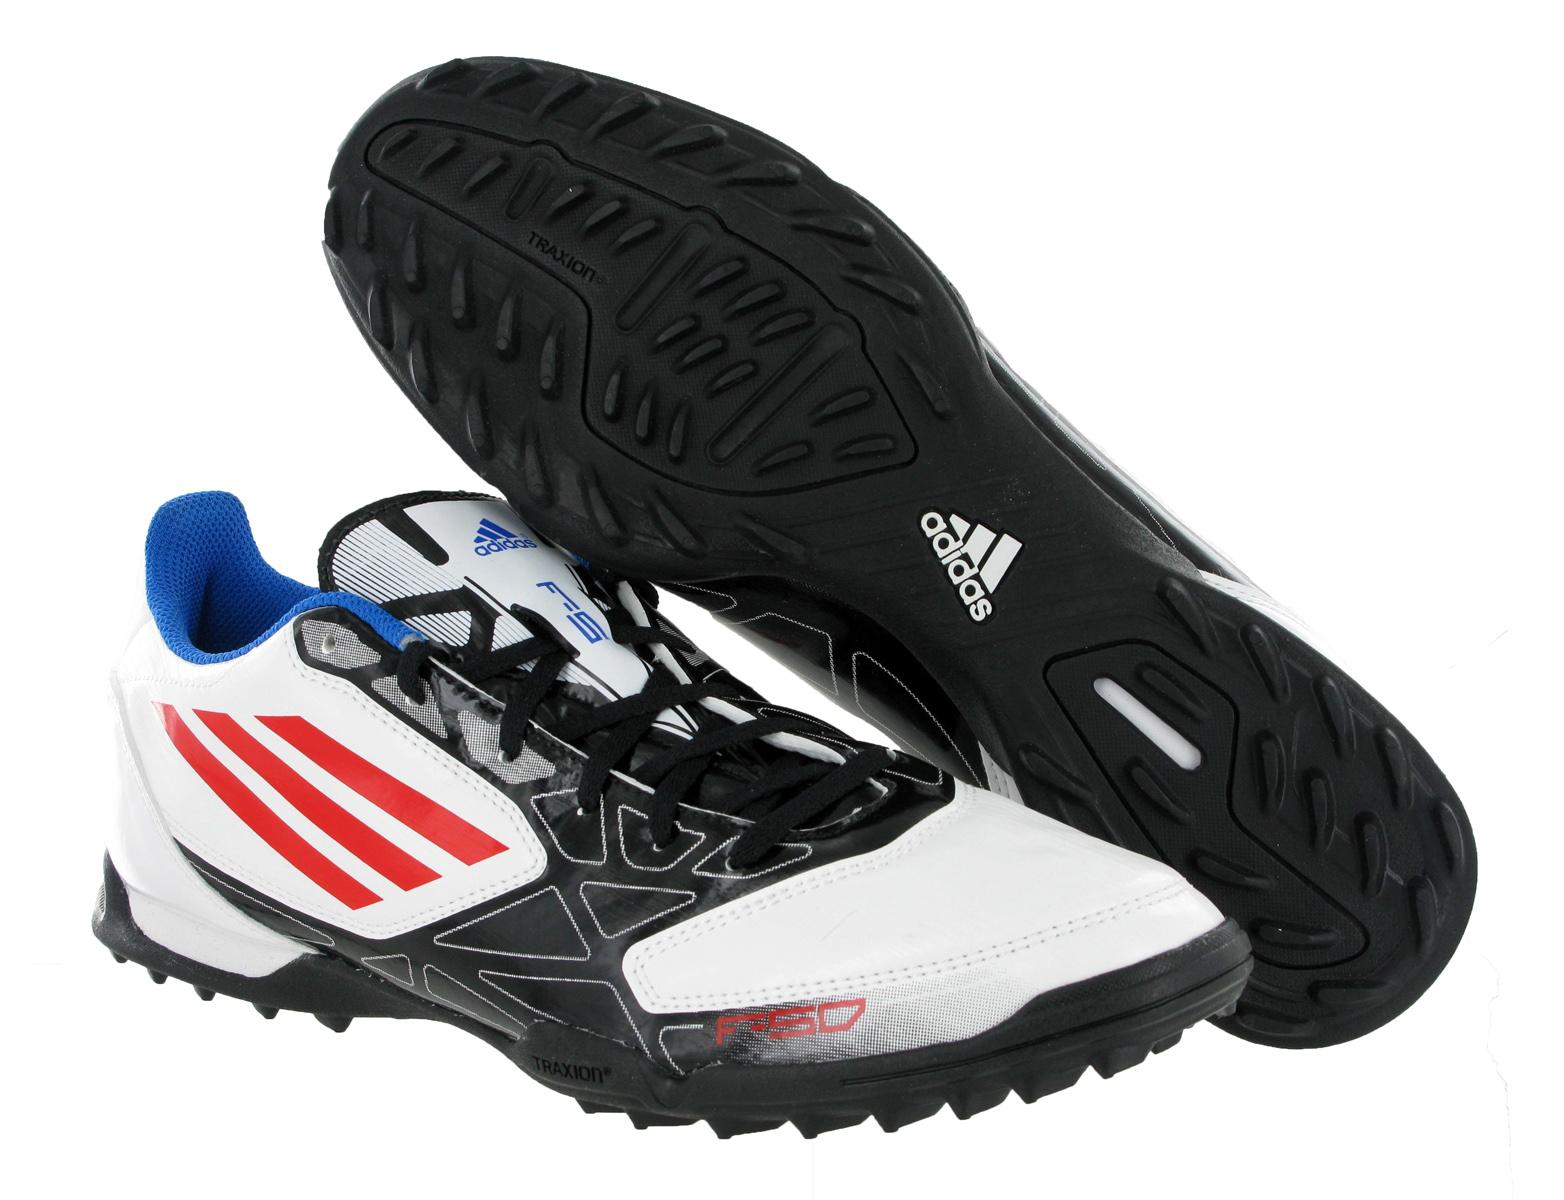 new mens adidas f5 trx tf white black astro turf football boots size 6 12 uk ebay